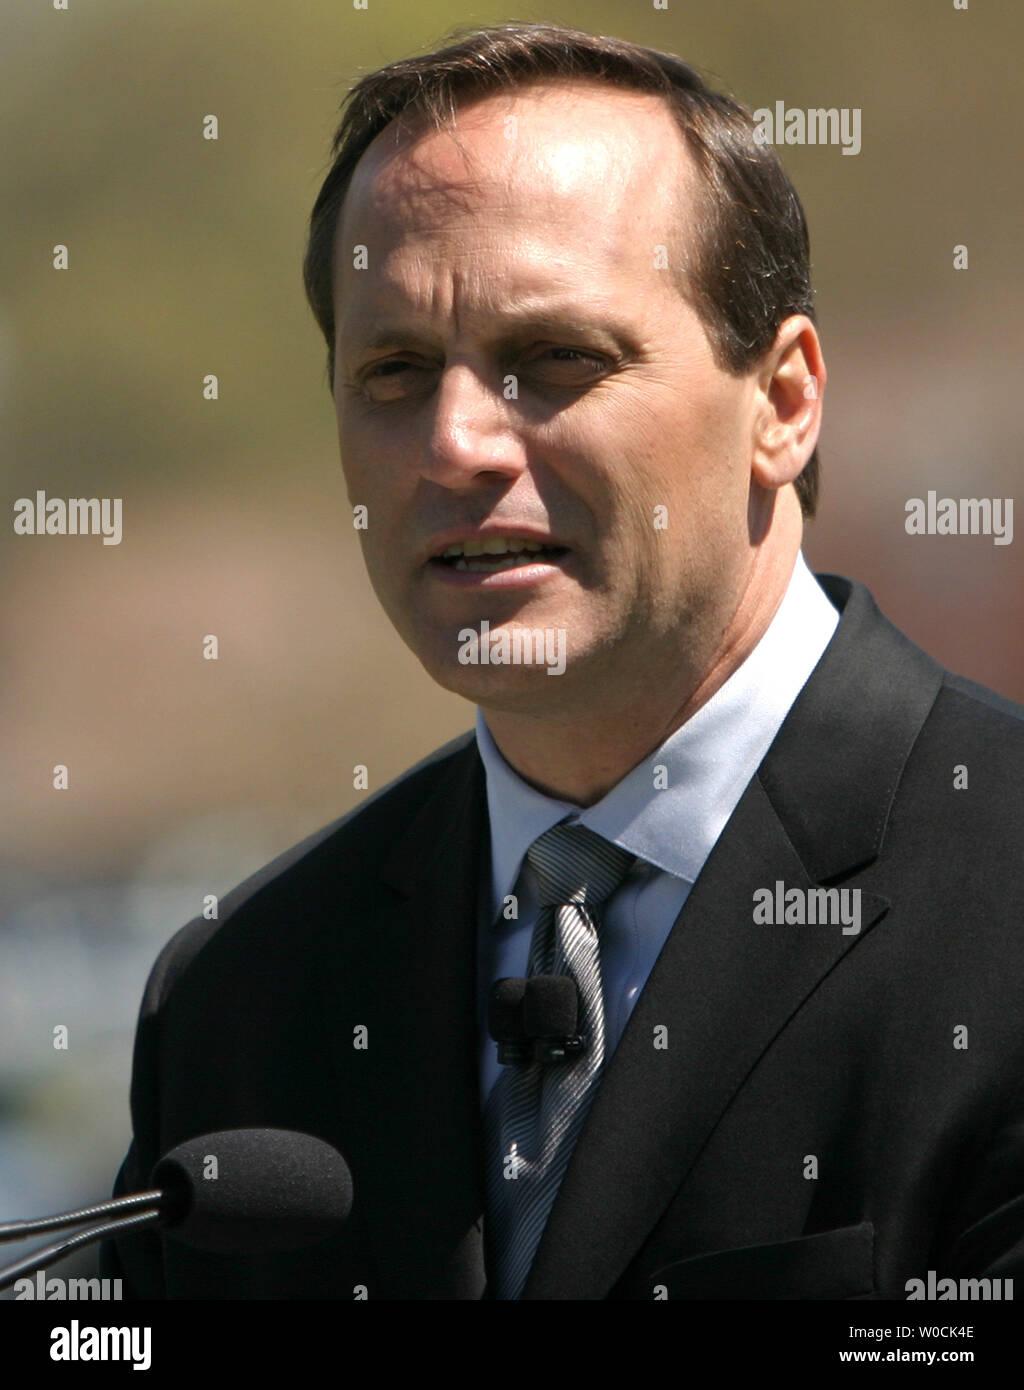 Ridenour Auto Group >> Group Executive Vice President Stock Photos & Group